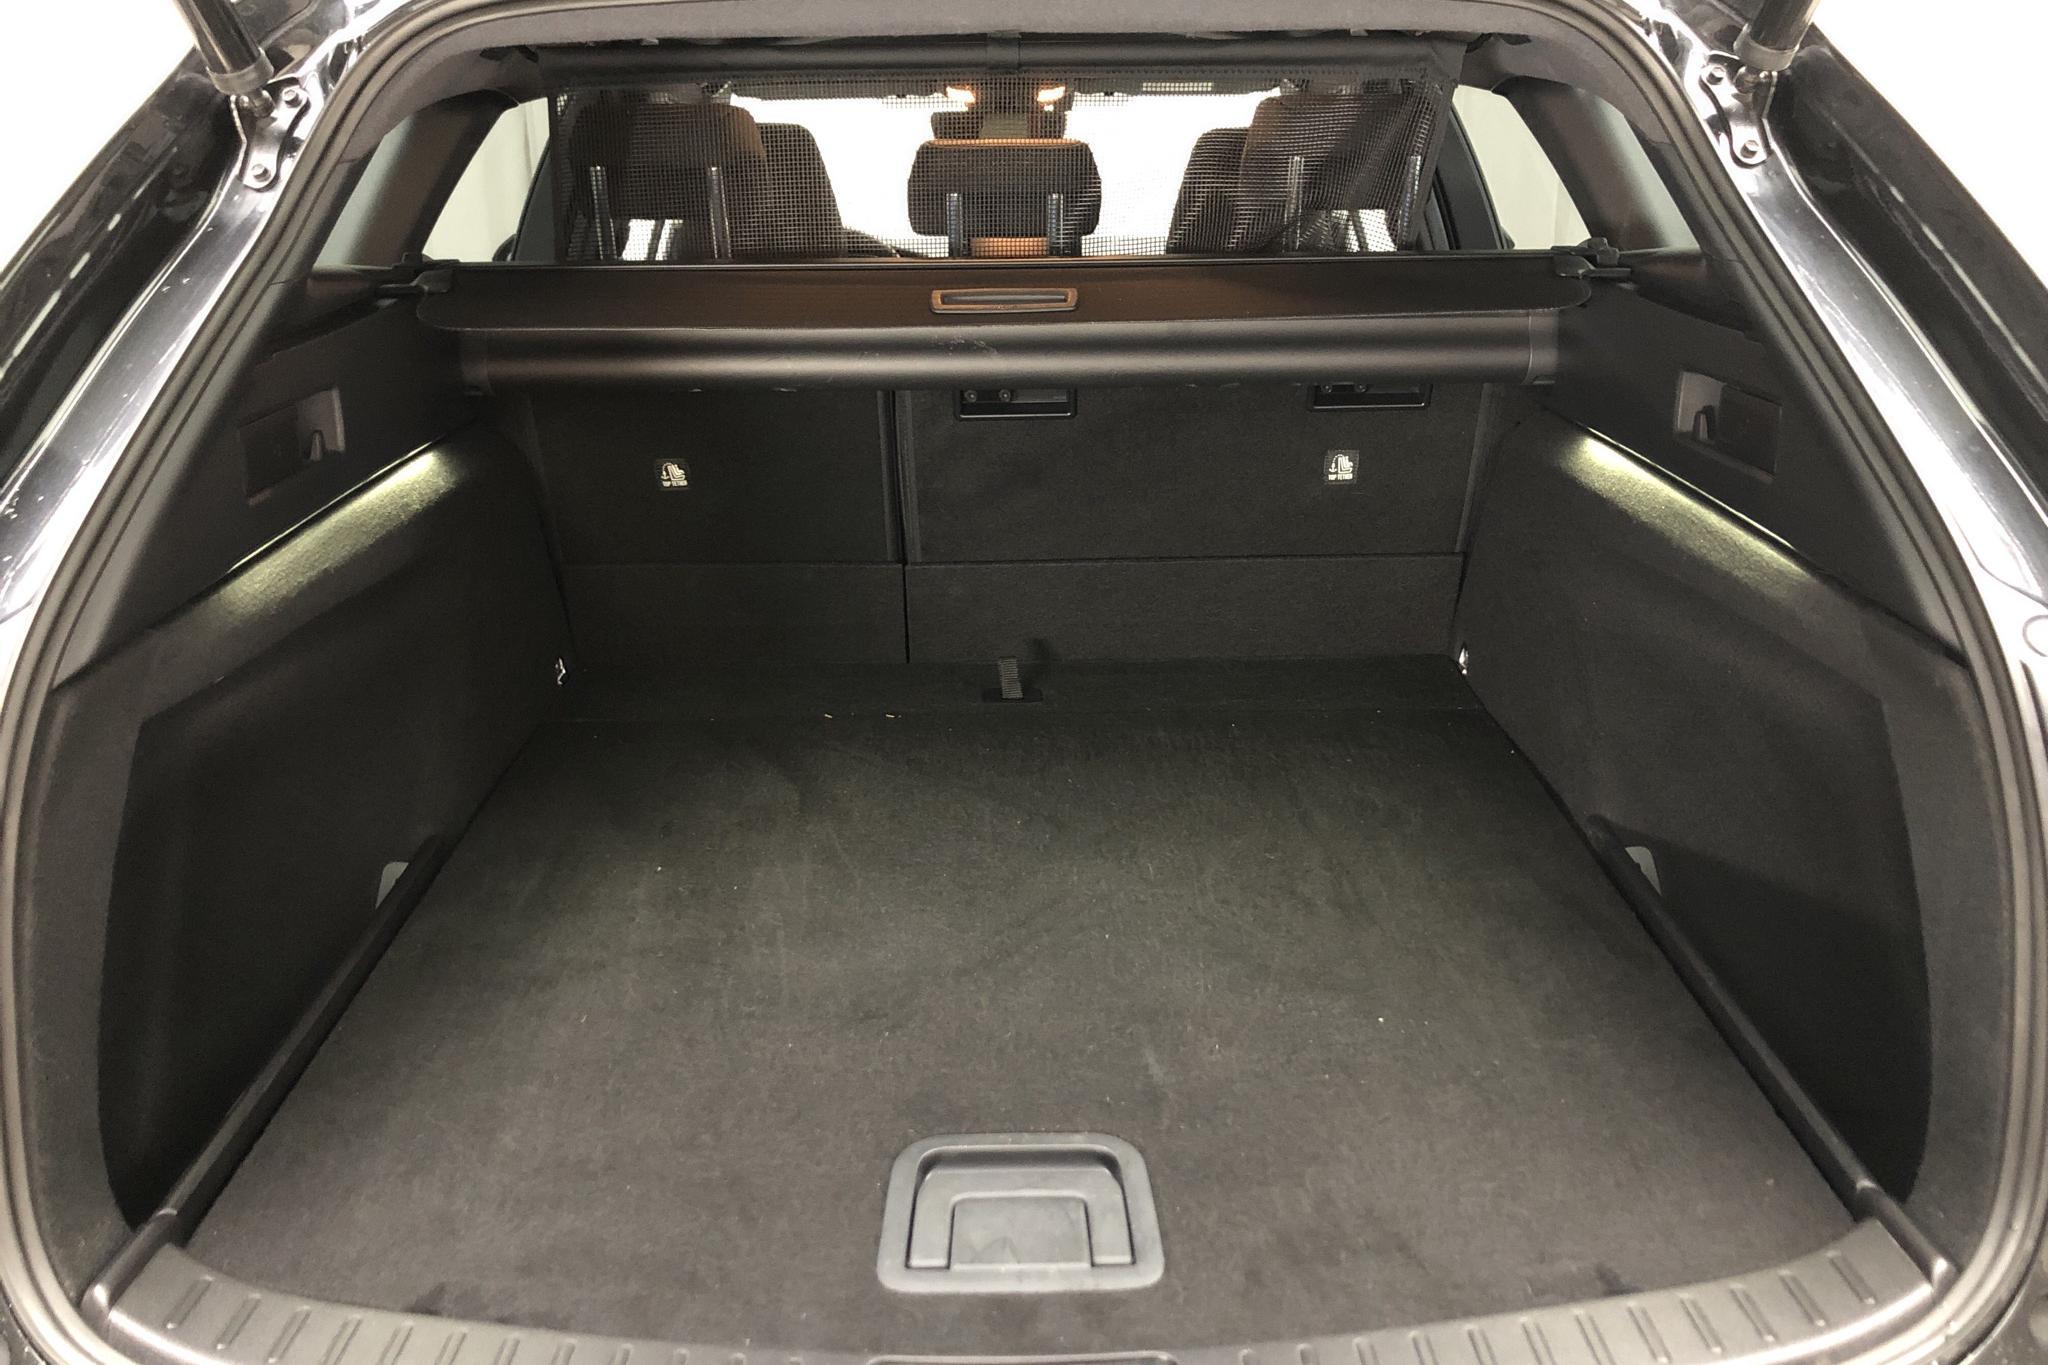 Toyota Corolla 1.8 Hybrid Touring Sports (122hk) - 1 054 mil - Automat - svart - 2020